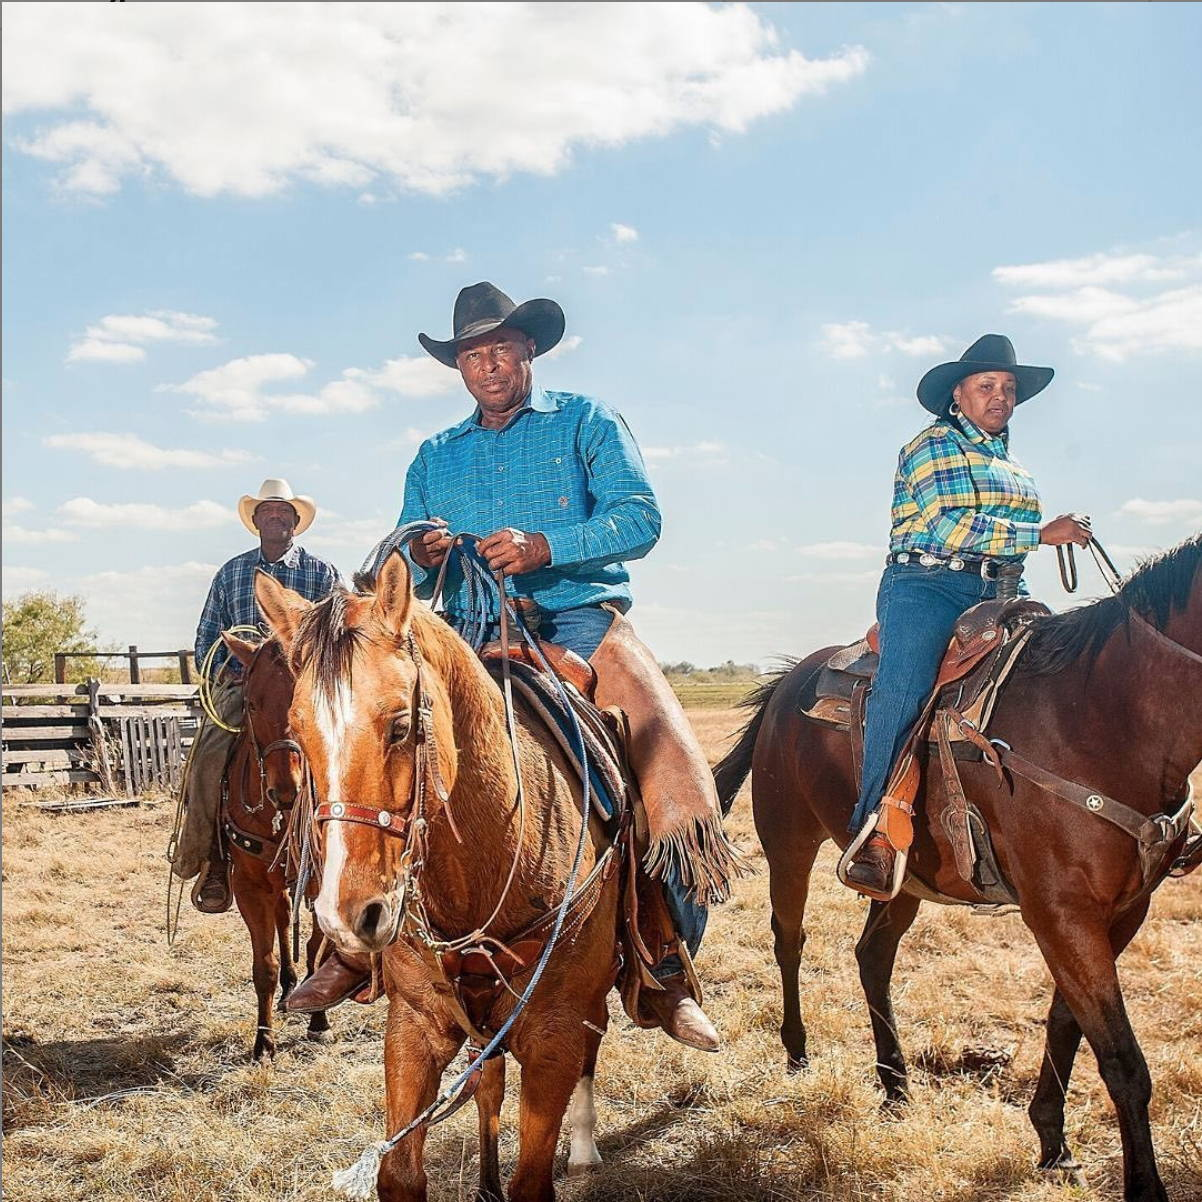 Black cowboys riding horseback from The Forgotten Cowboys project